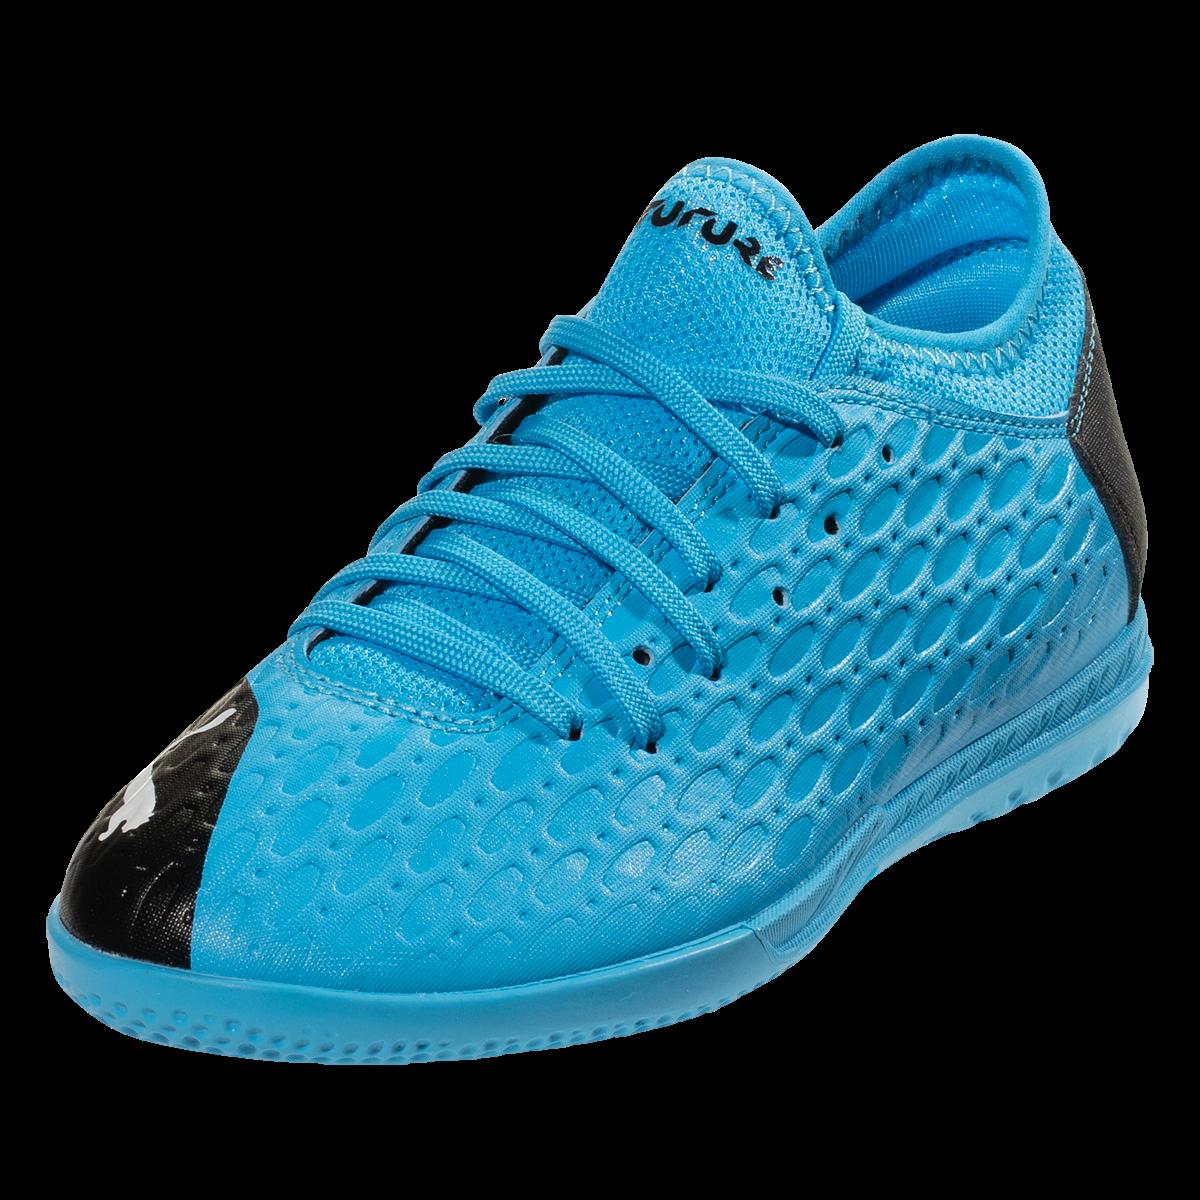 PUMA FUTURE 5.4 IT Jr Indoor Soccer Shoe BlueBlackPink 5.5